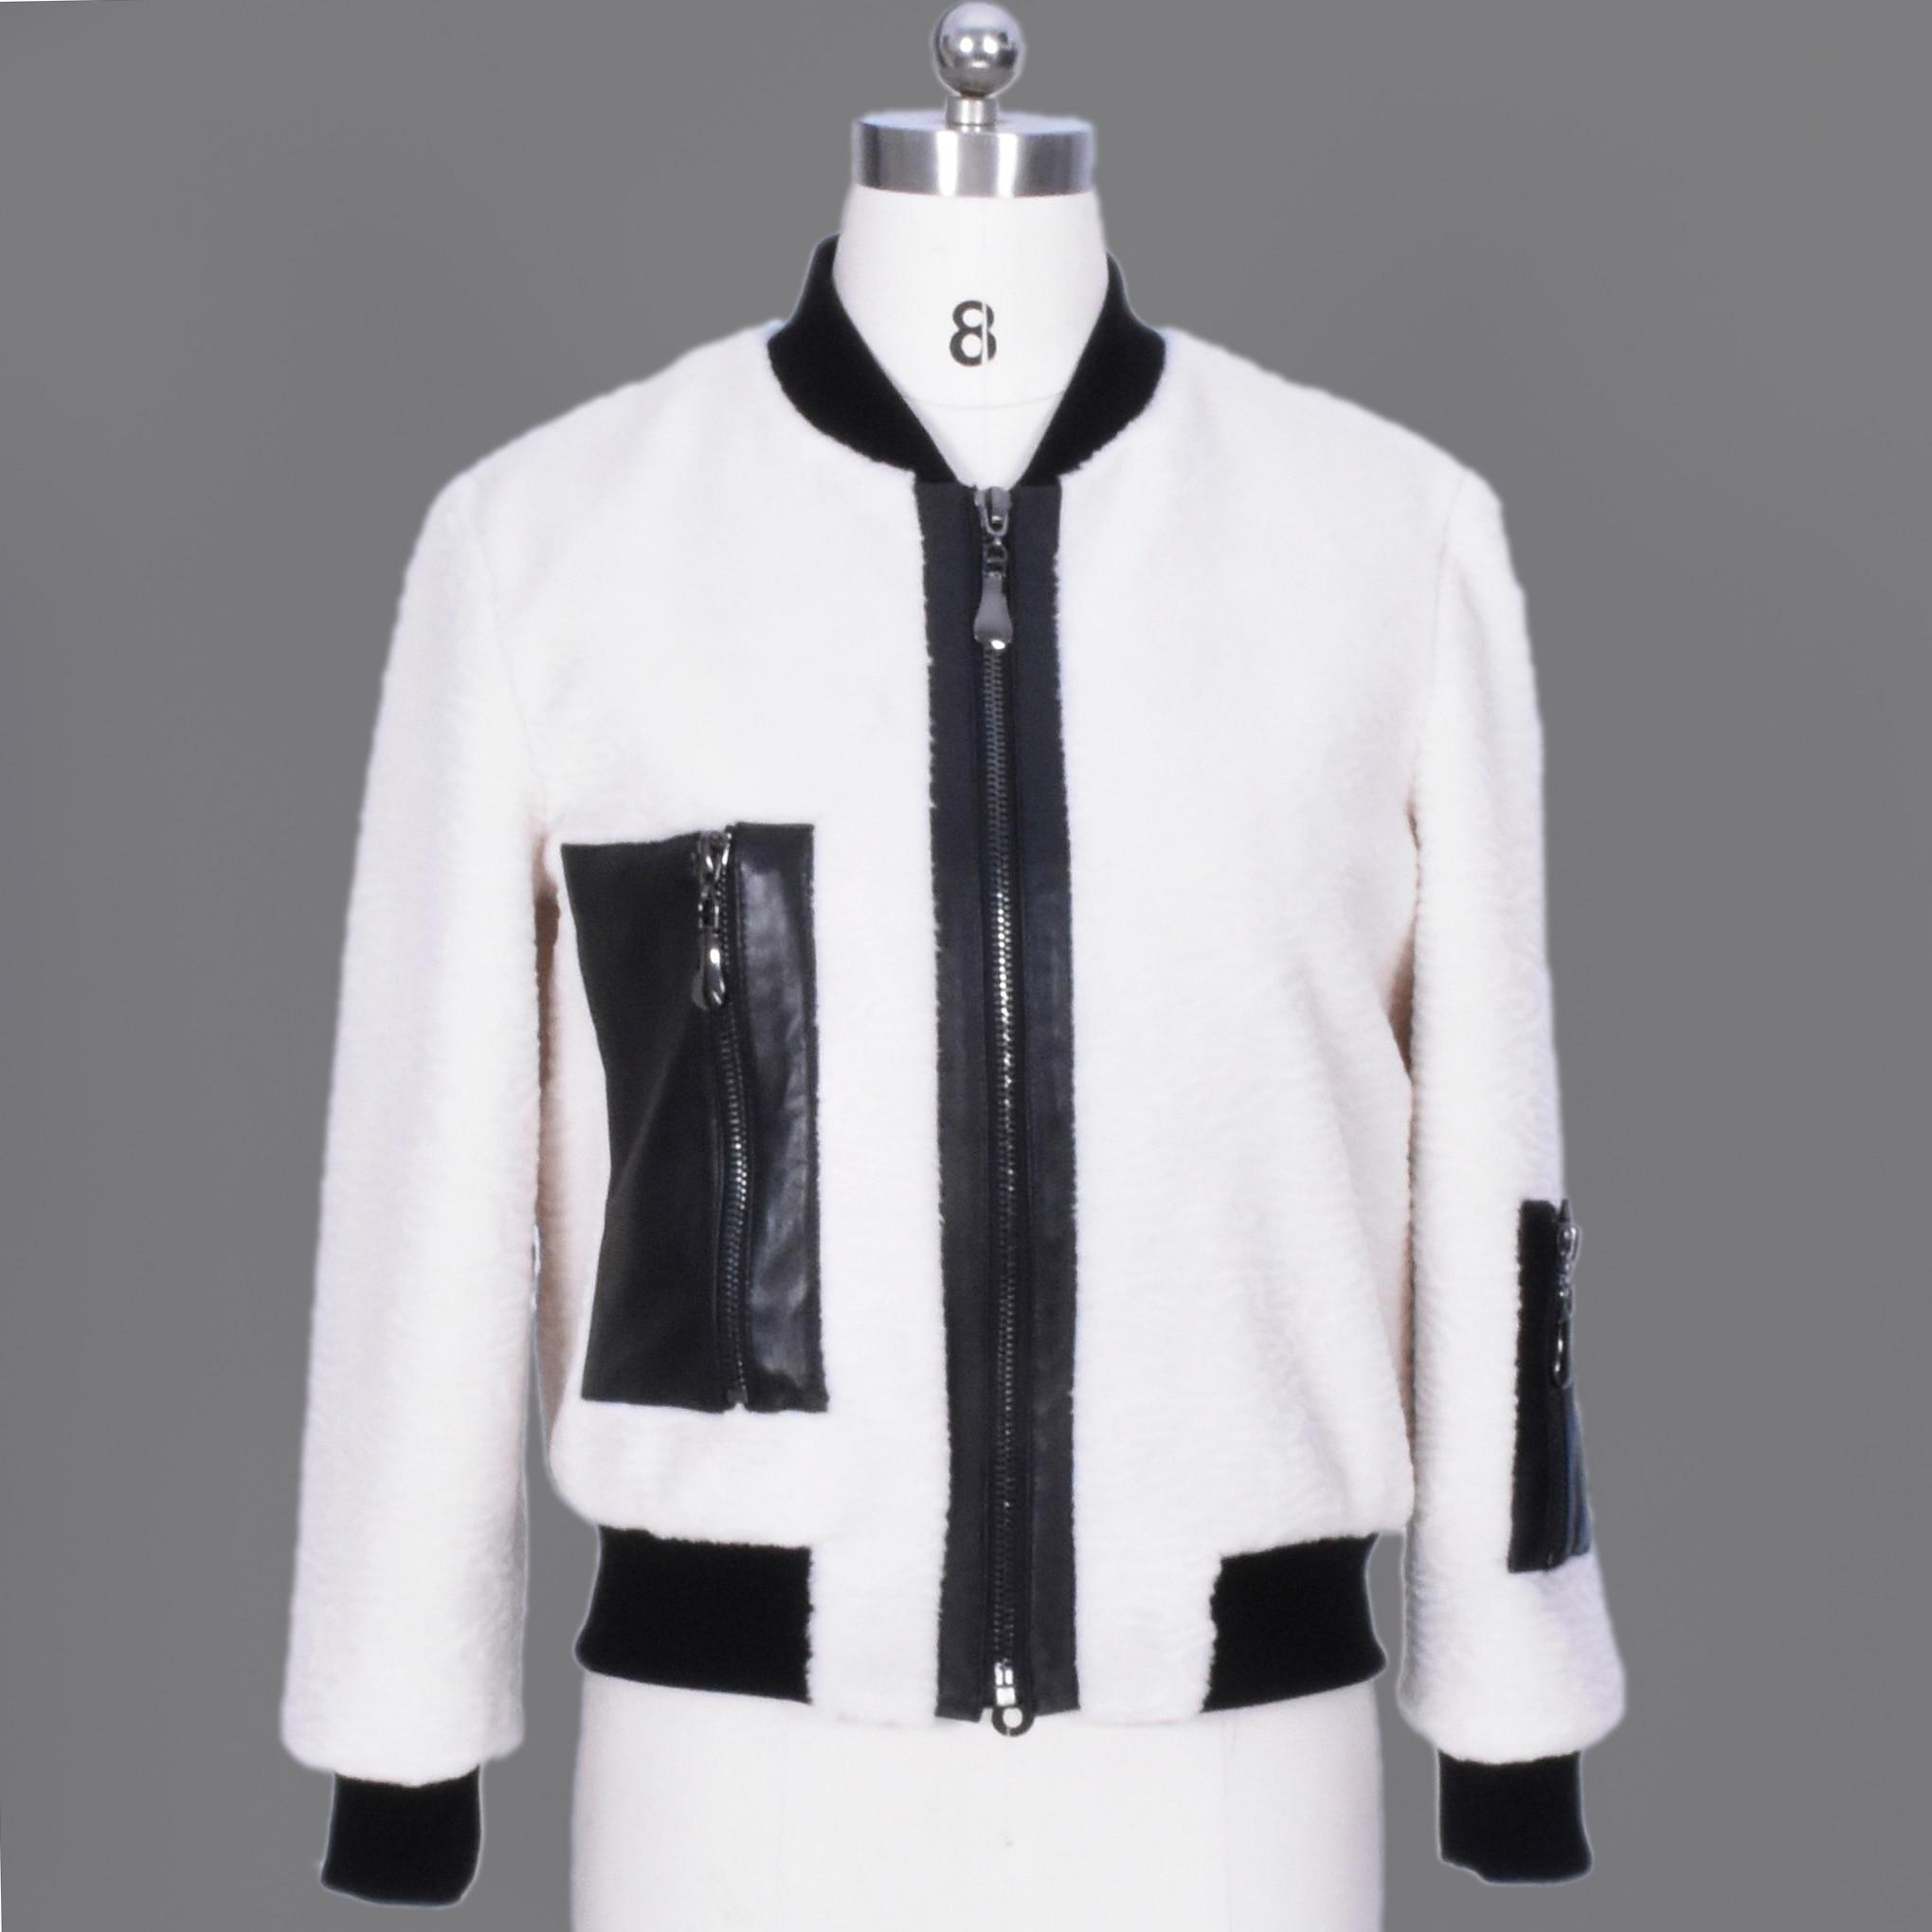 Leather jacket online australia - Ms Fur Sheep Sheared Fur Women S Jacket From Australia Brands Of Demosi Hot Sale Ladies